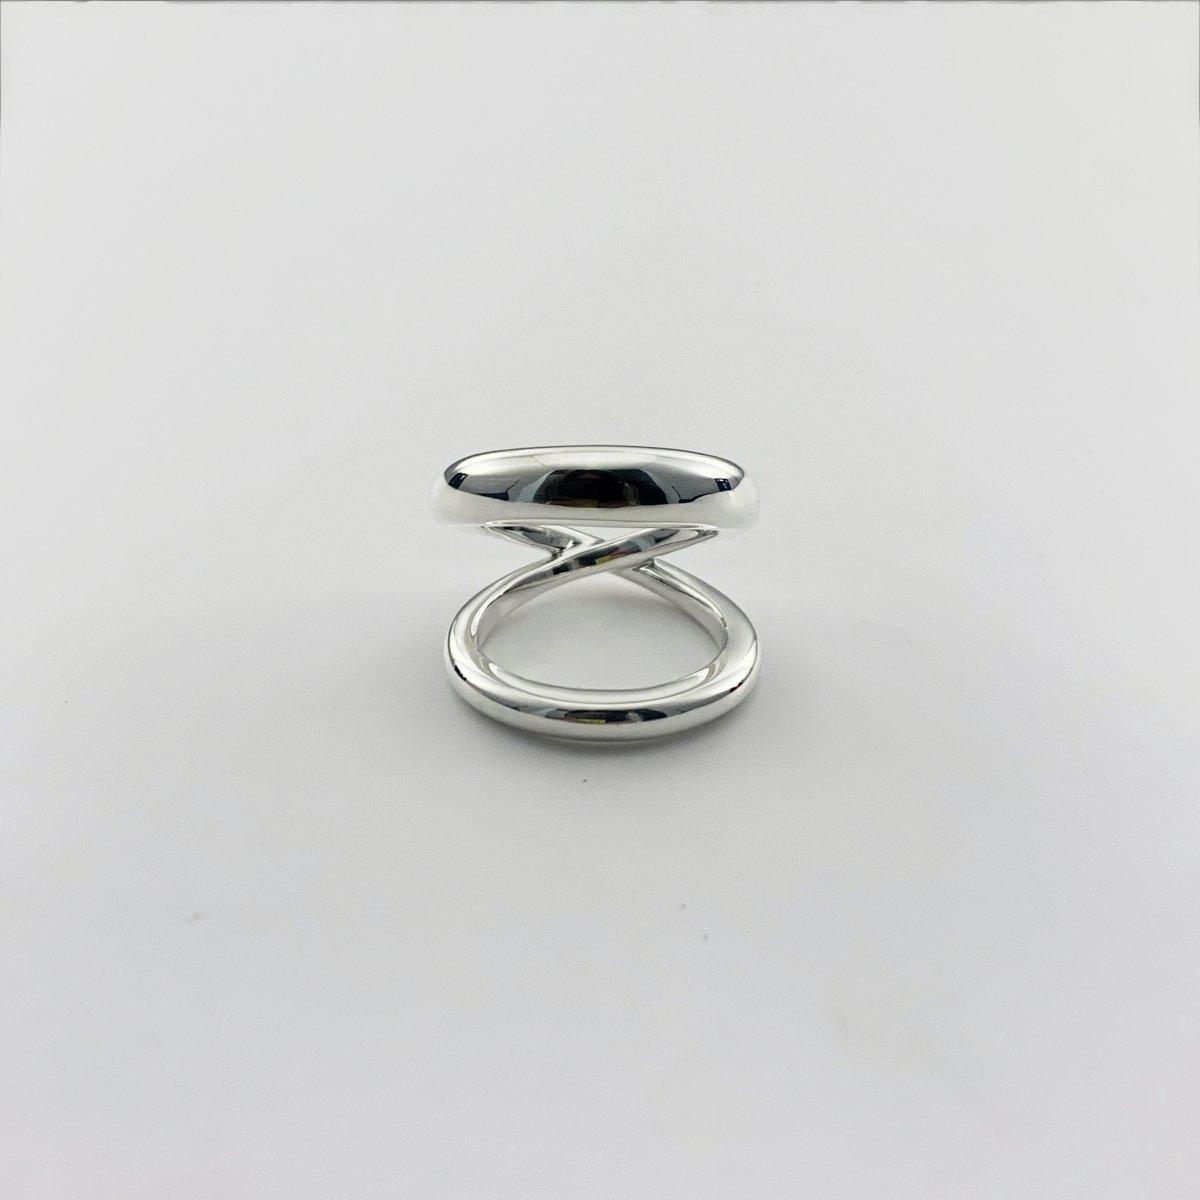 NEW ww ring